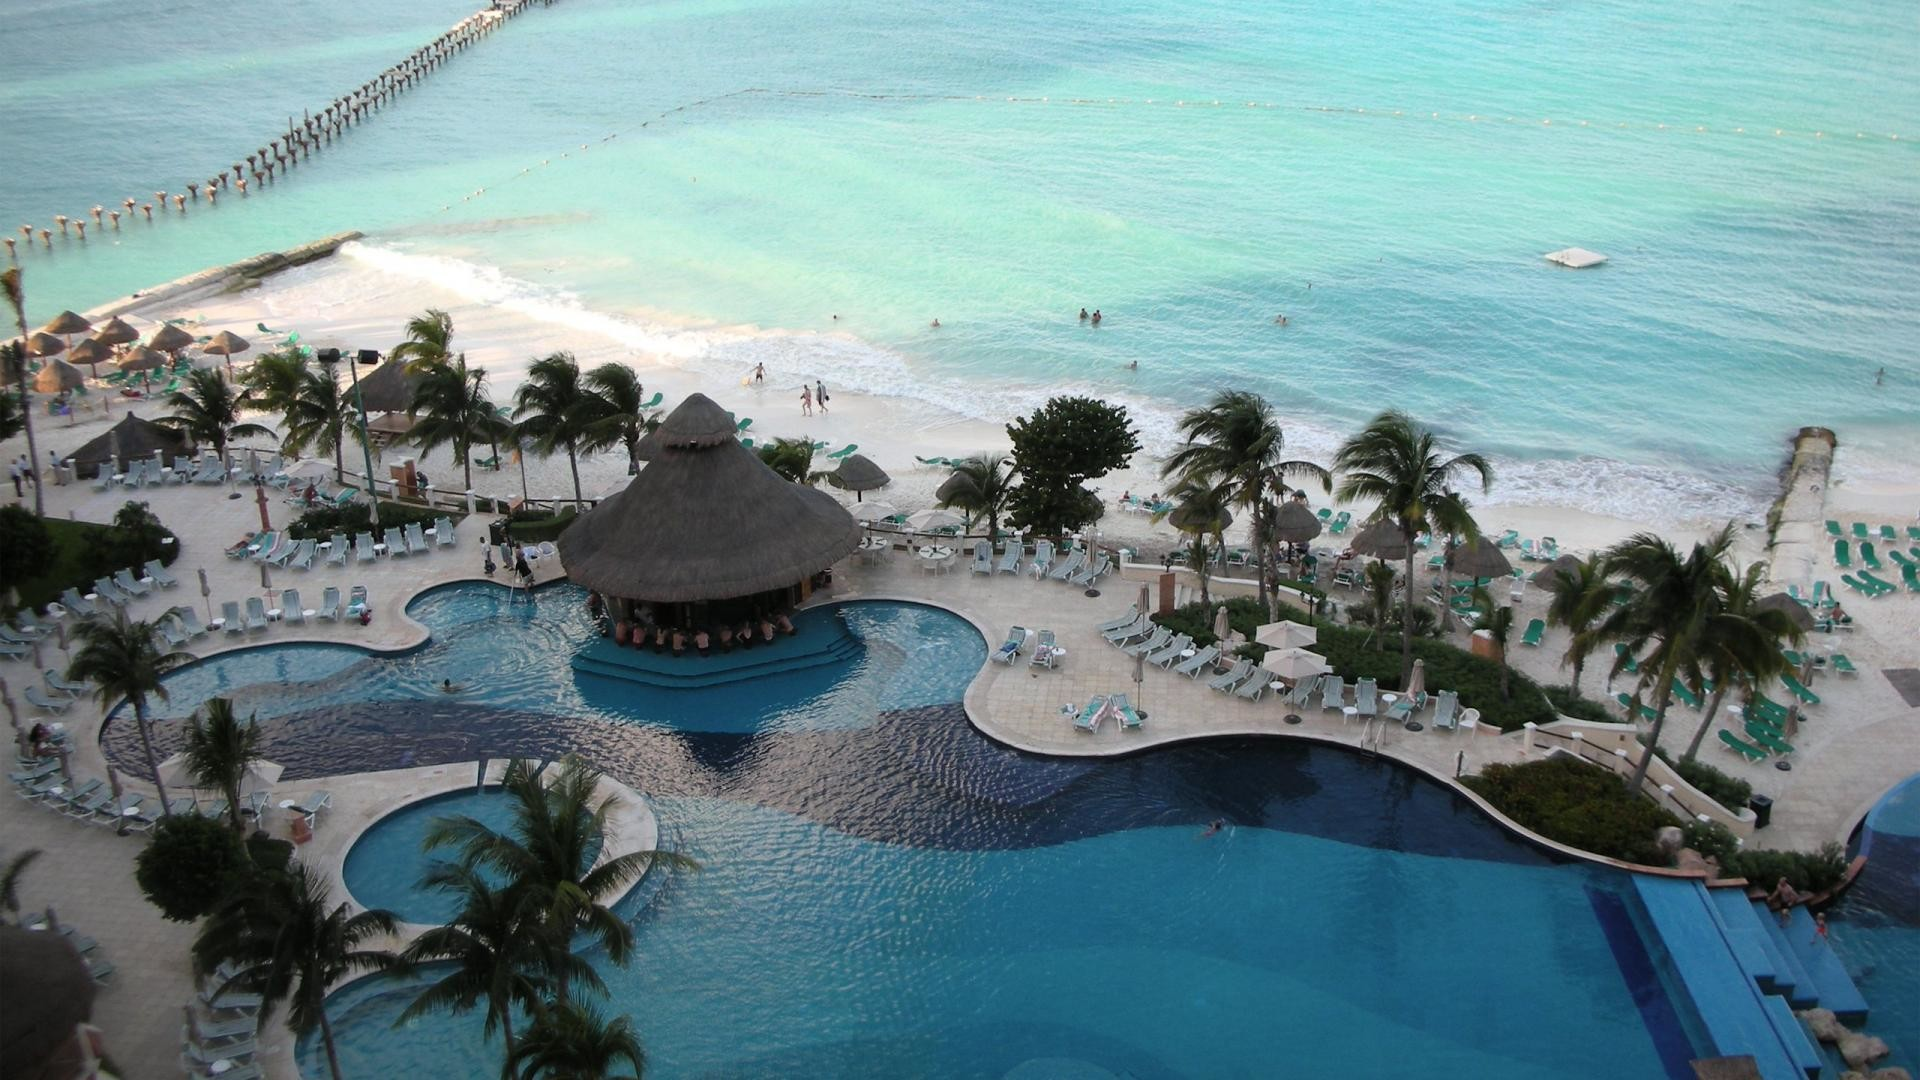 Cancun Mexico Beach Resort HD Wallpaper